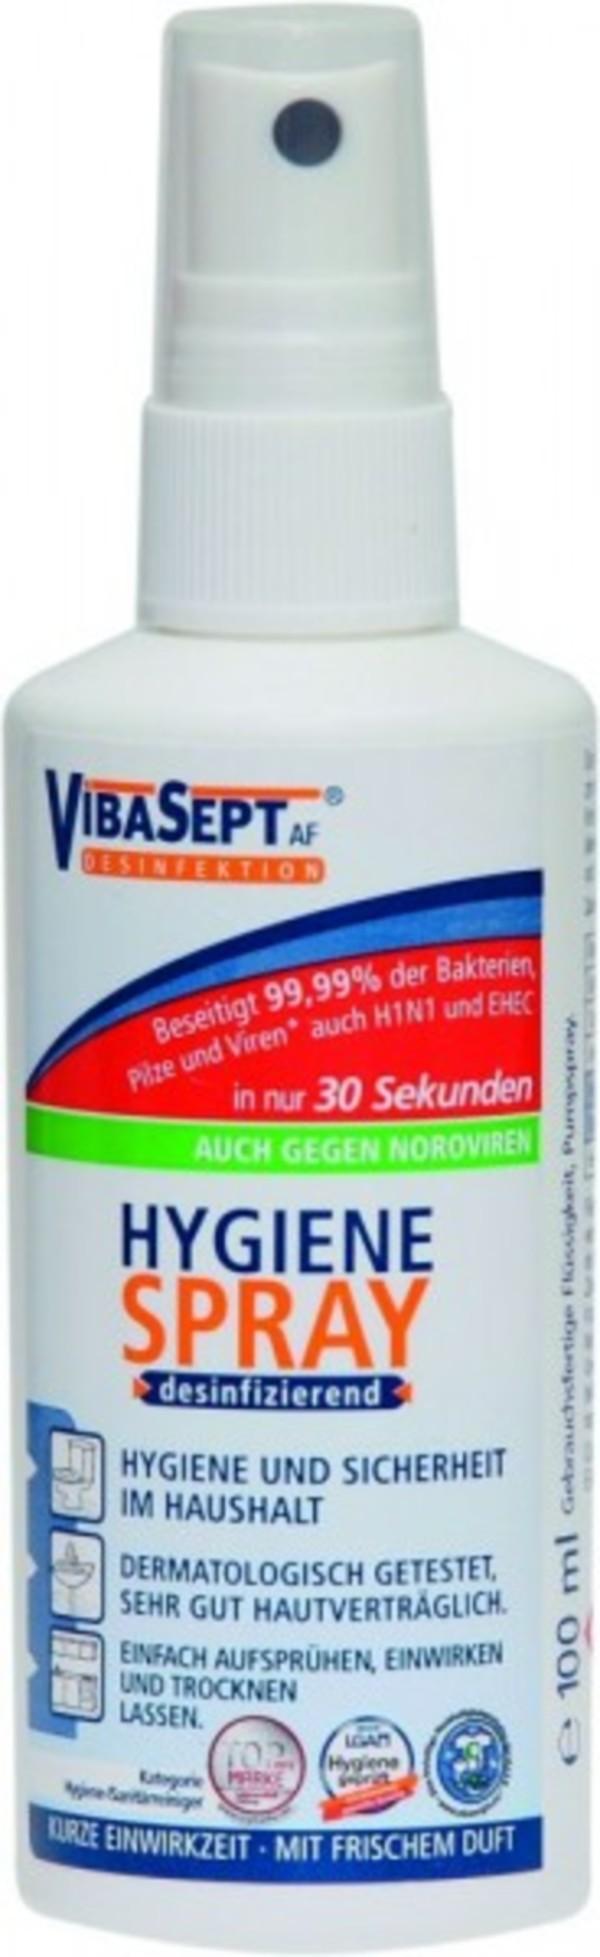 Vibasept Desinfektionsspray 100 ml ,  Flächendesinfektionslösung